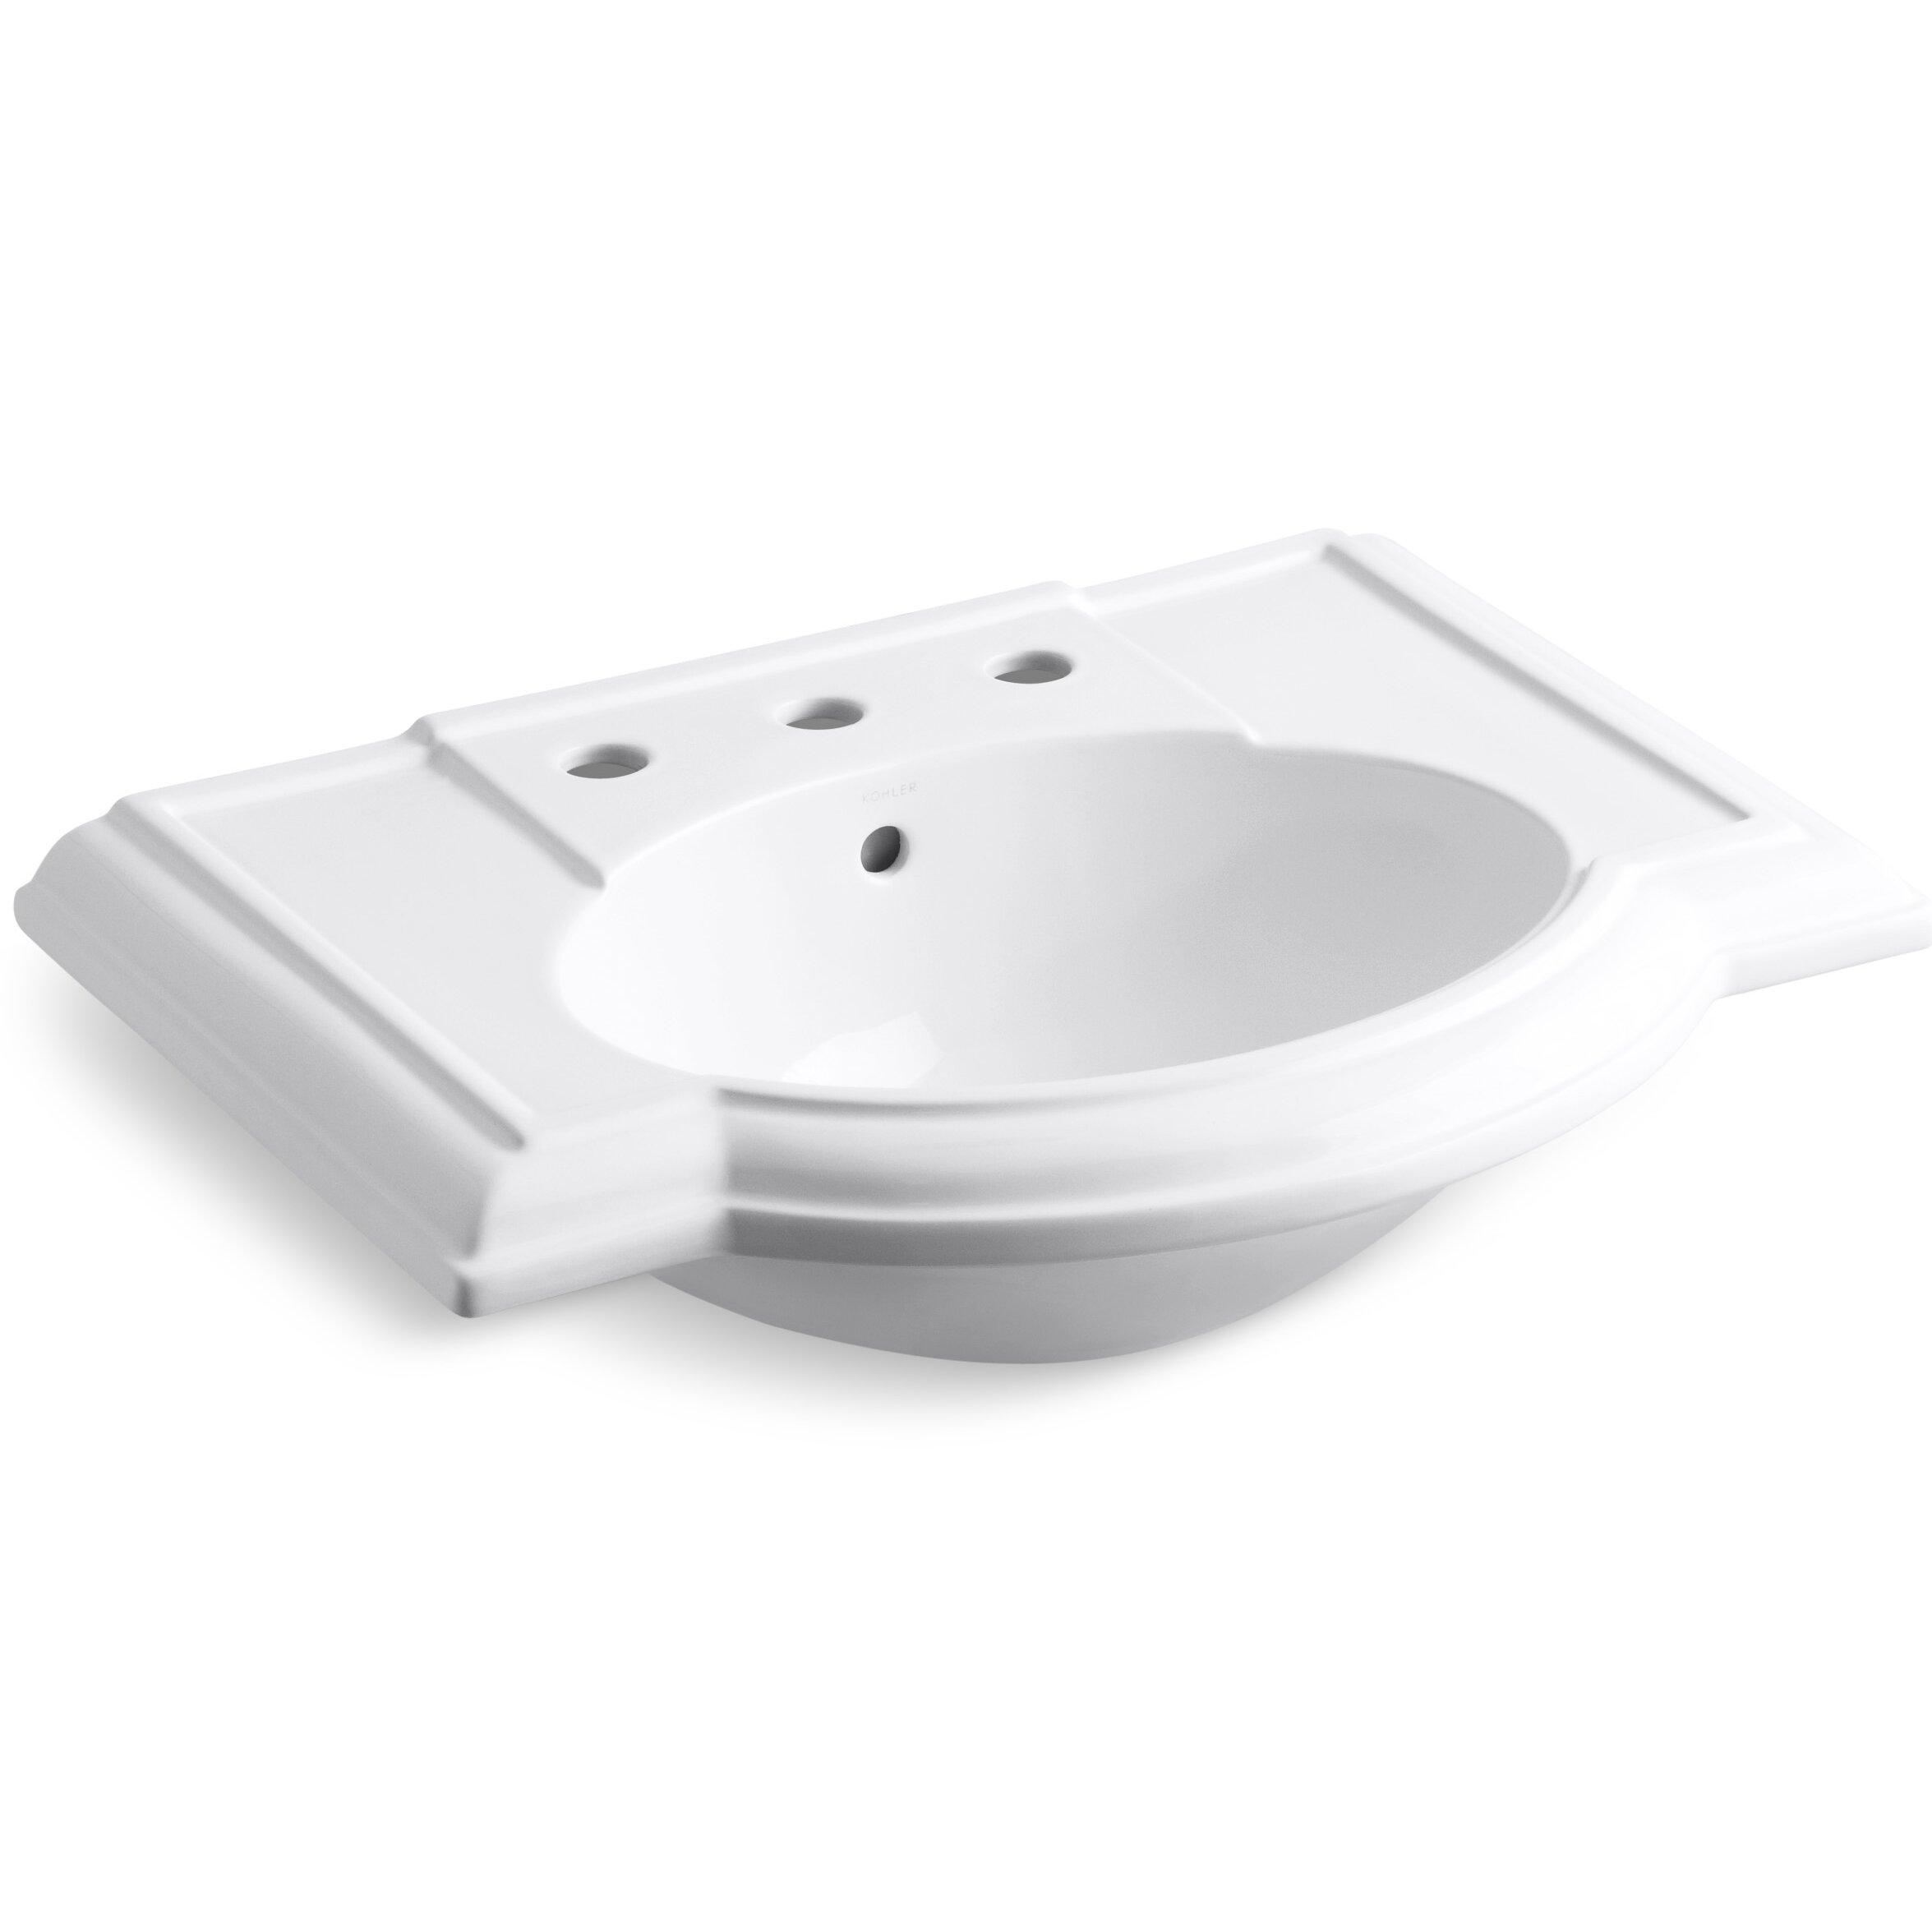 Kohler Devonshire Bathroom Sink With 8 Widespread Faucet